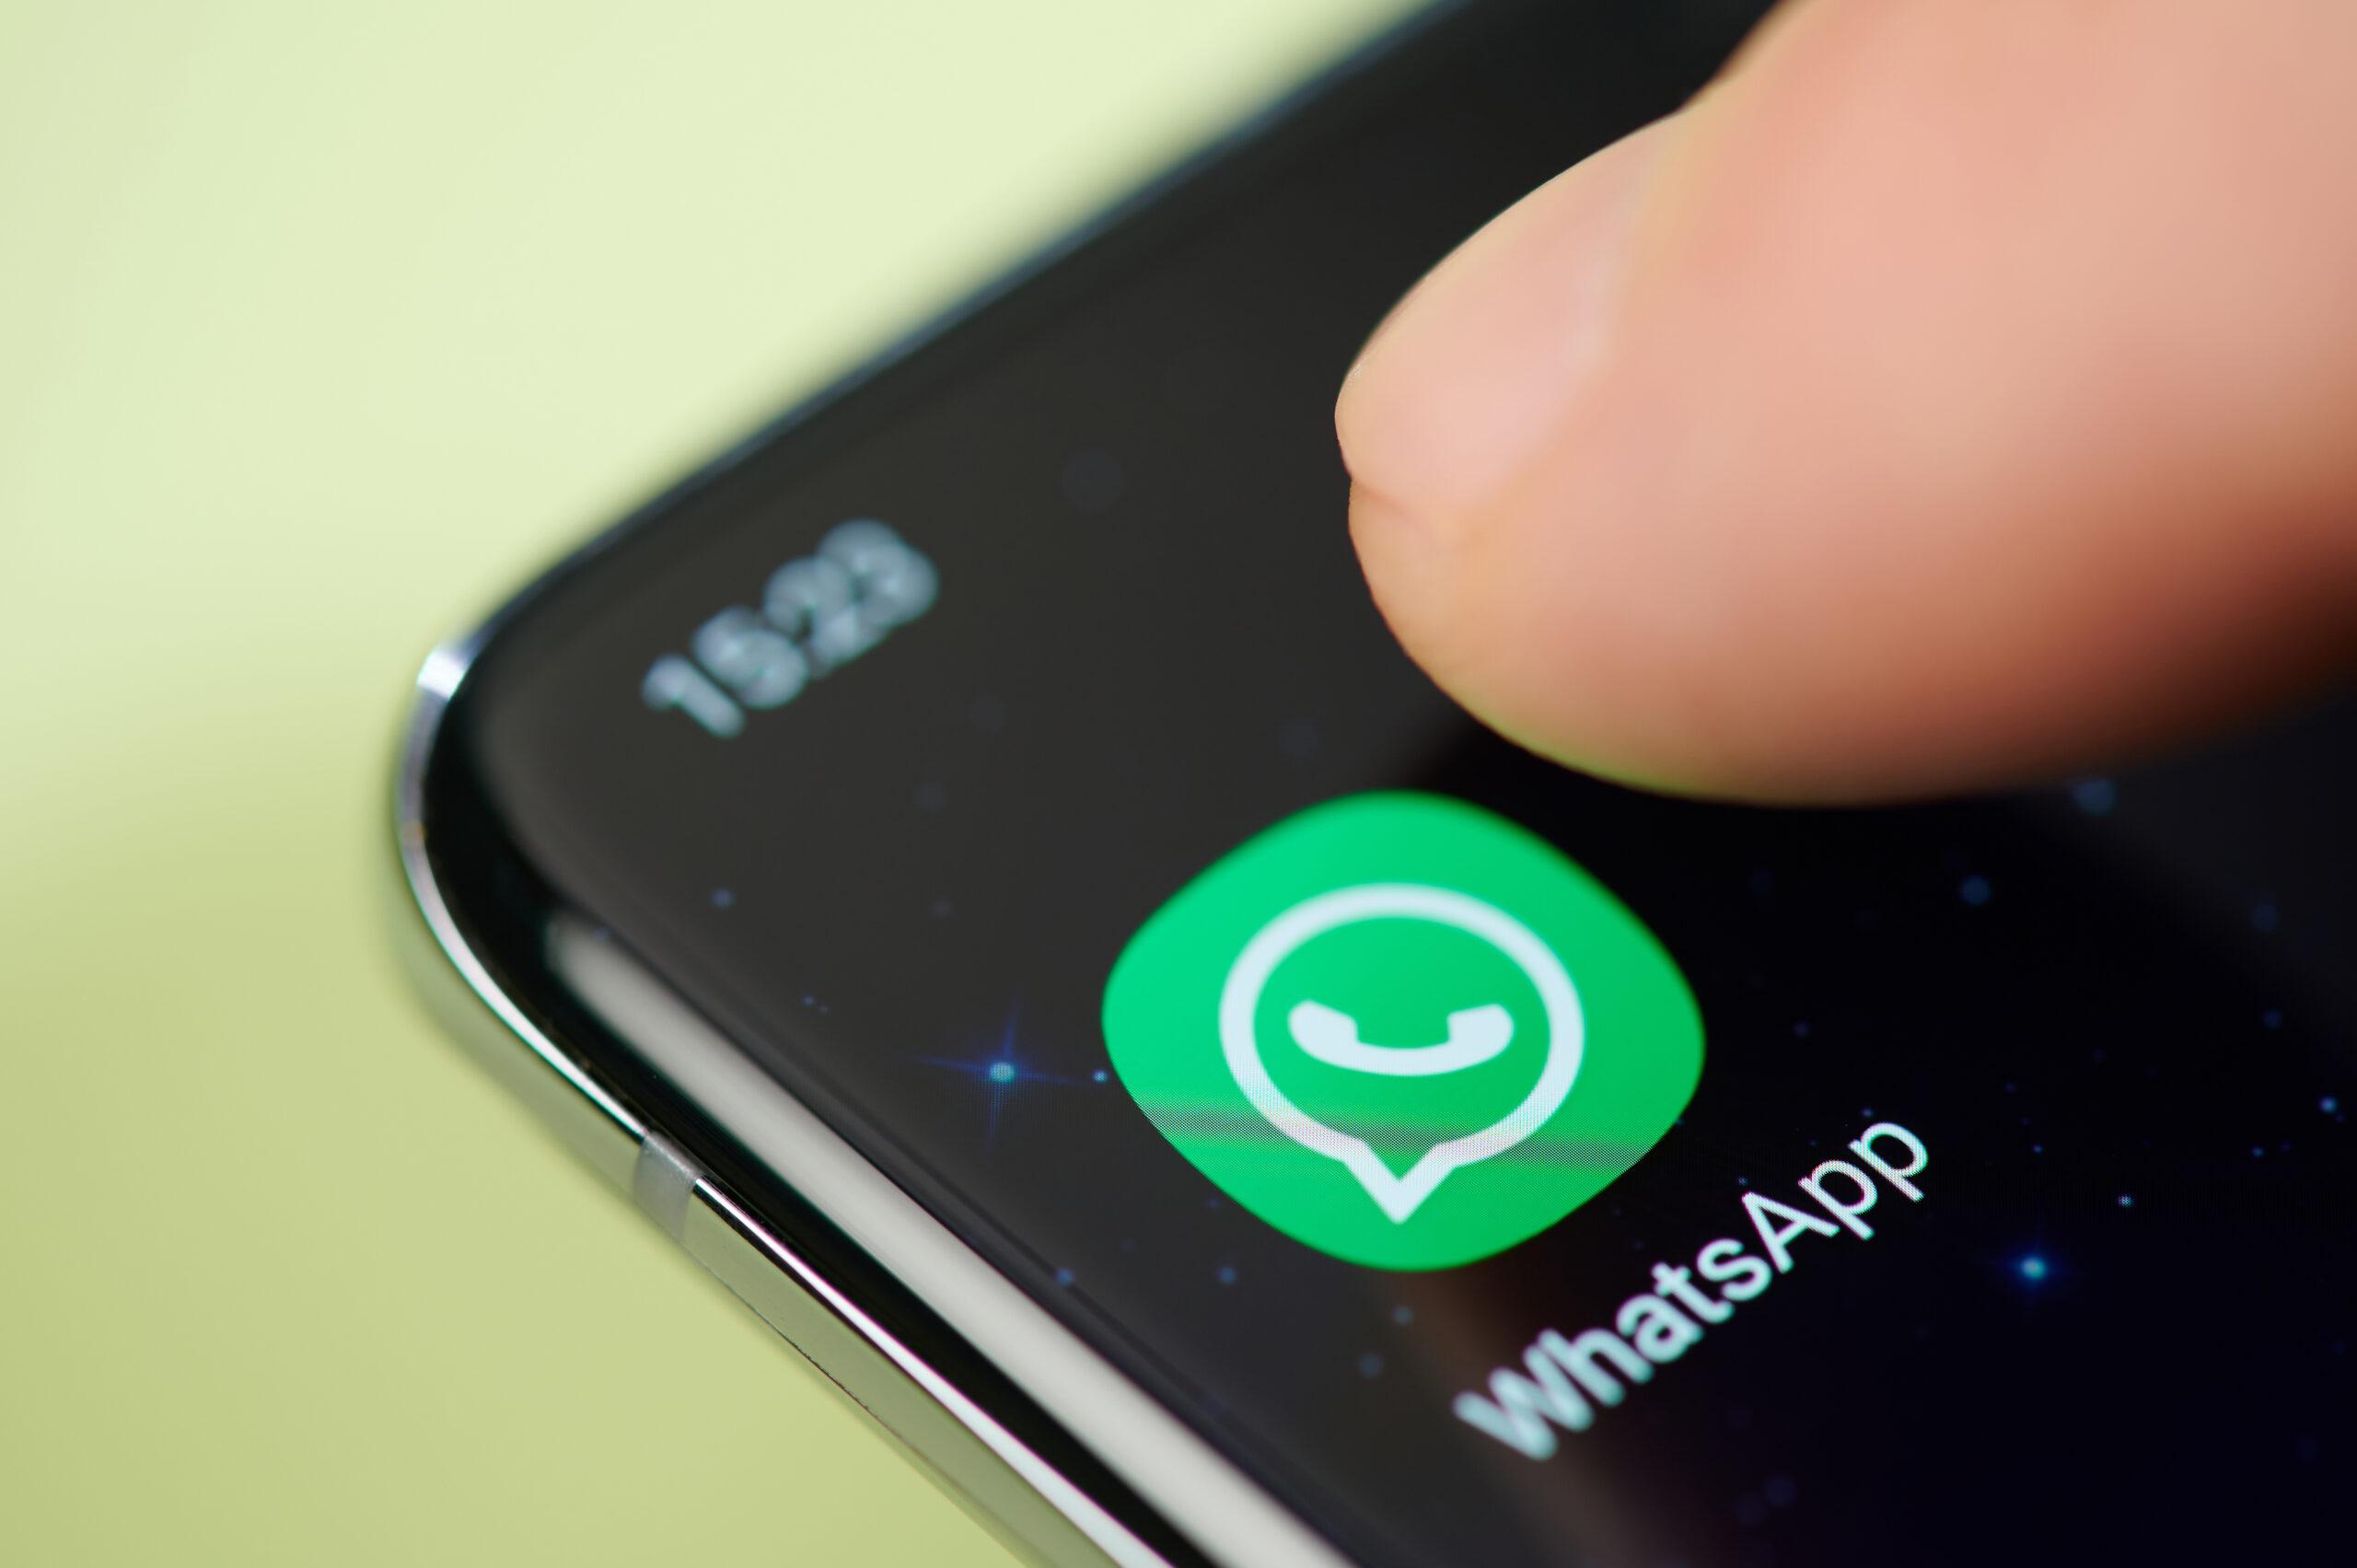 whatsapp icono pantalla dedo